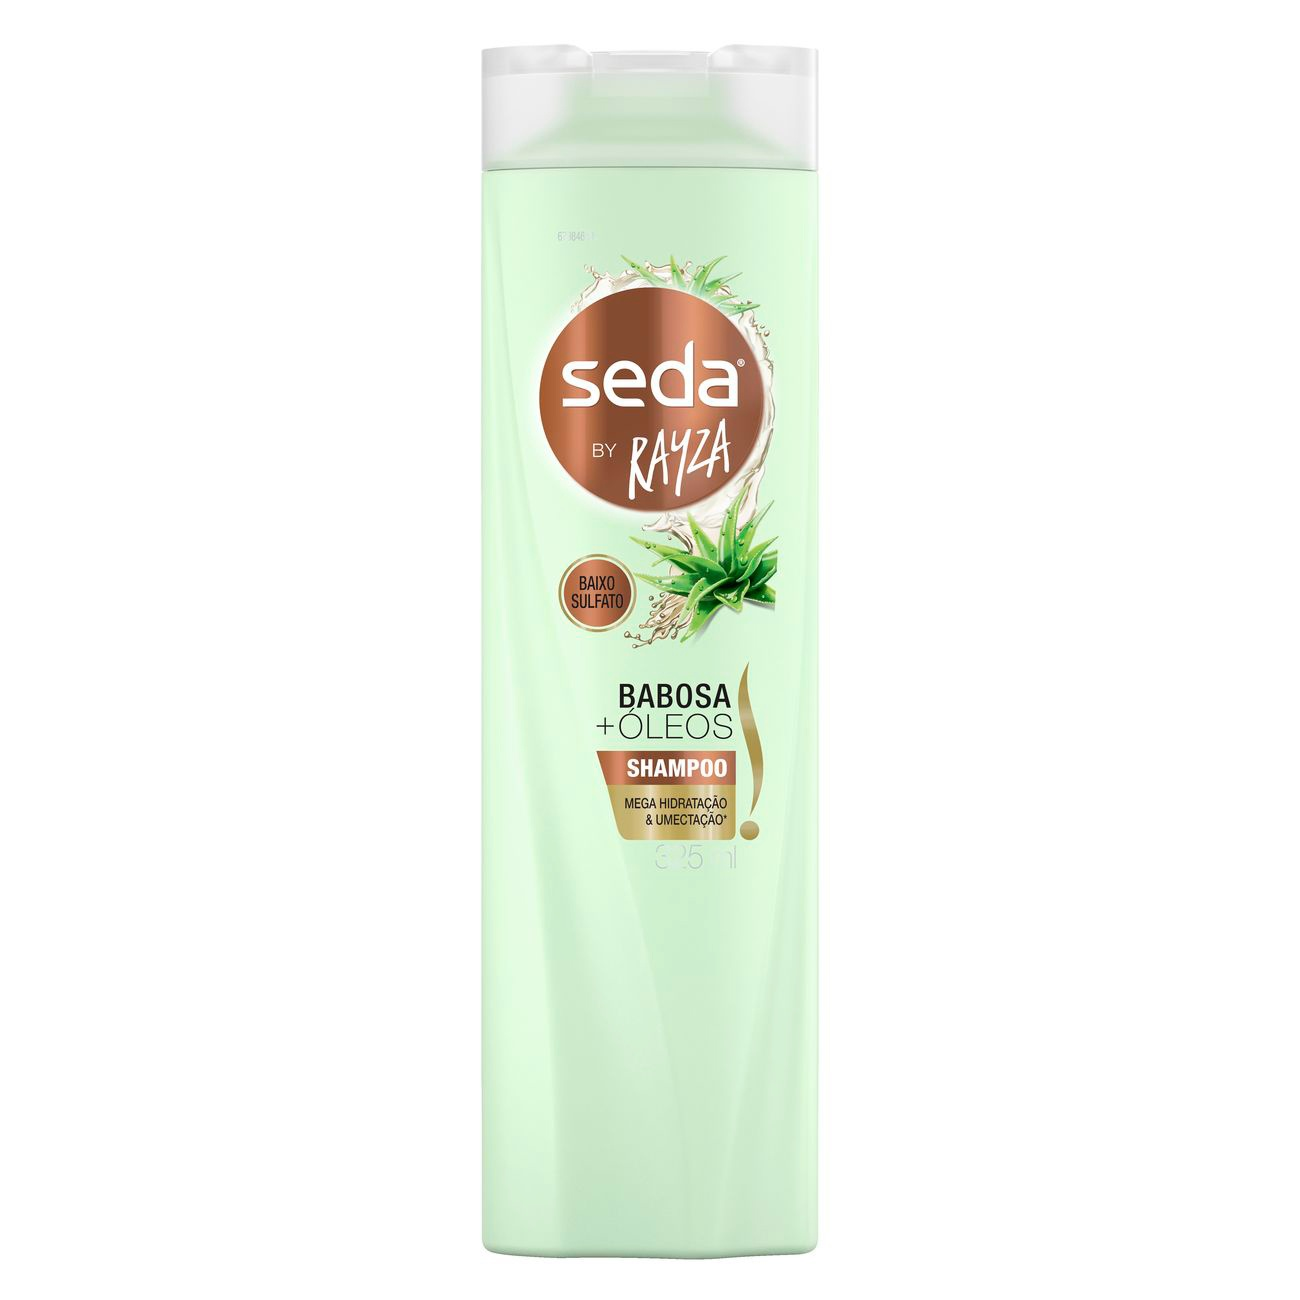 Shampoo Seda com Babosa + Oleos by Rayza 325ml